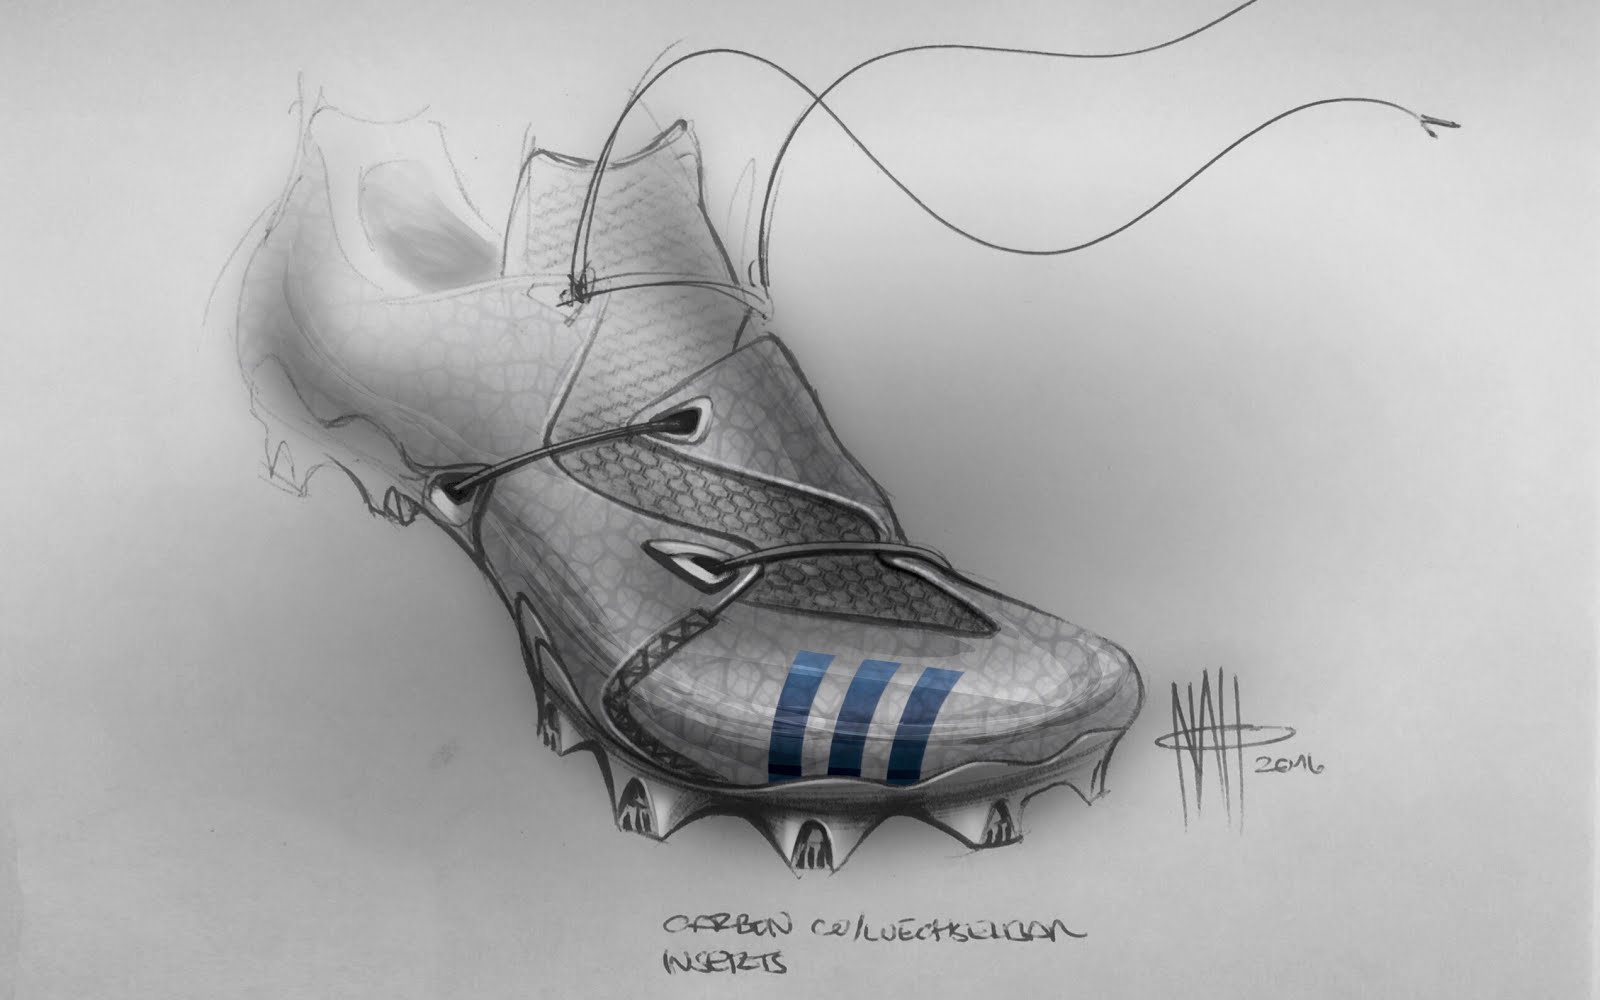 Noah Sussman Sports Product designer sketch footear Adidas performance football